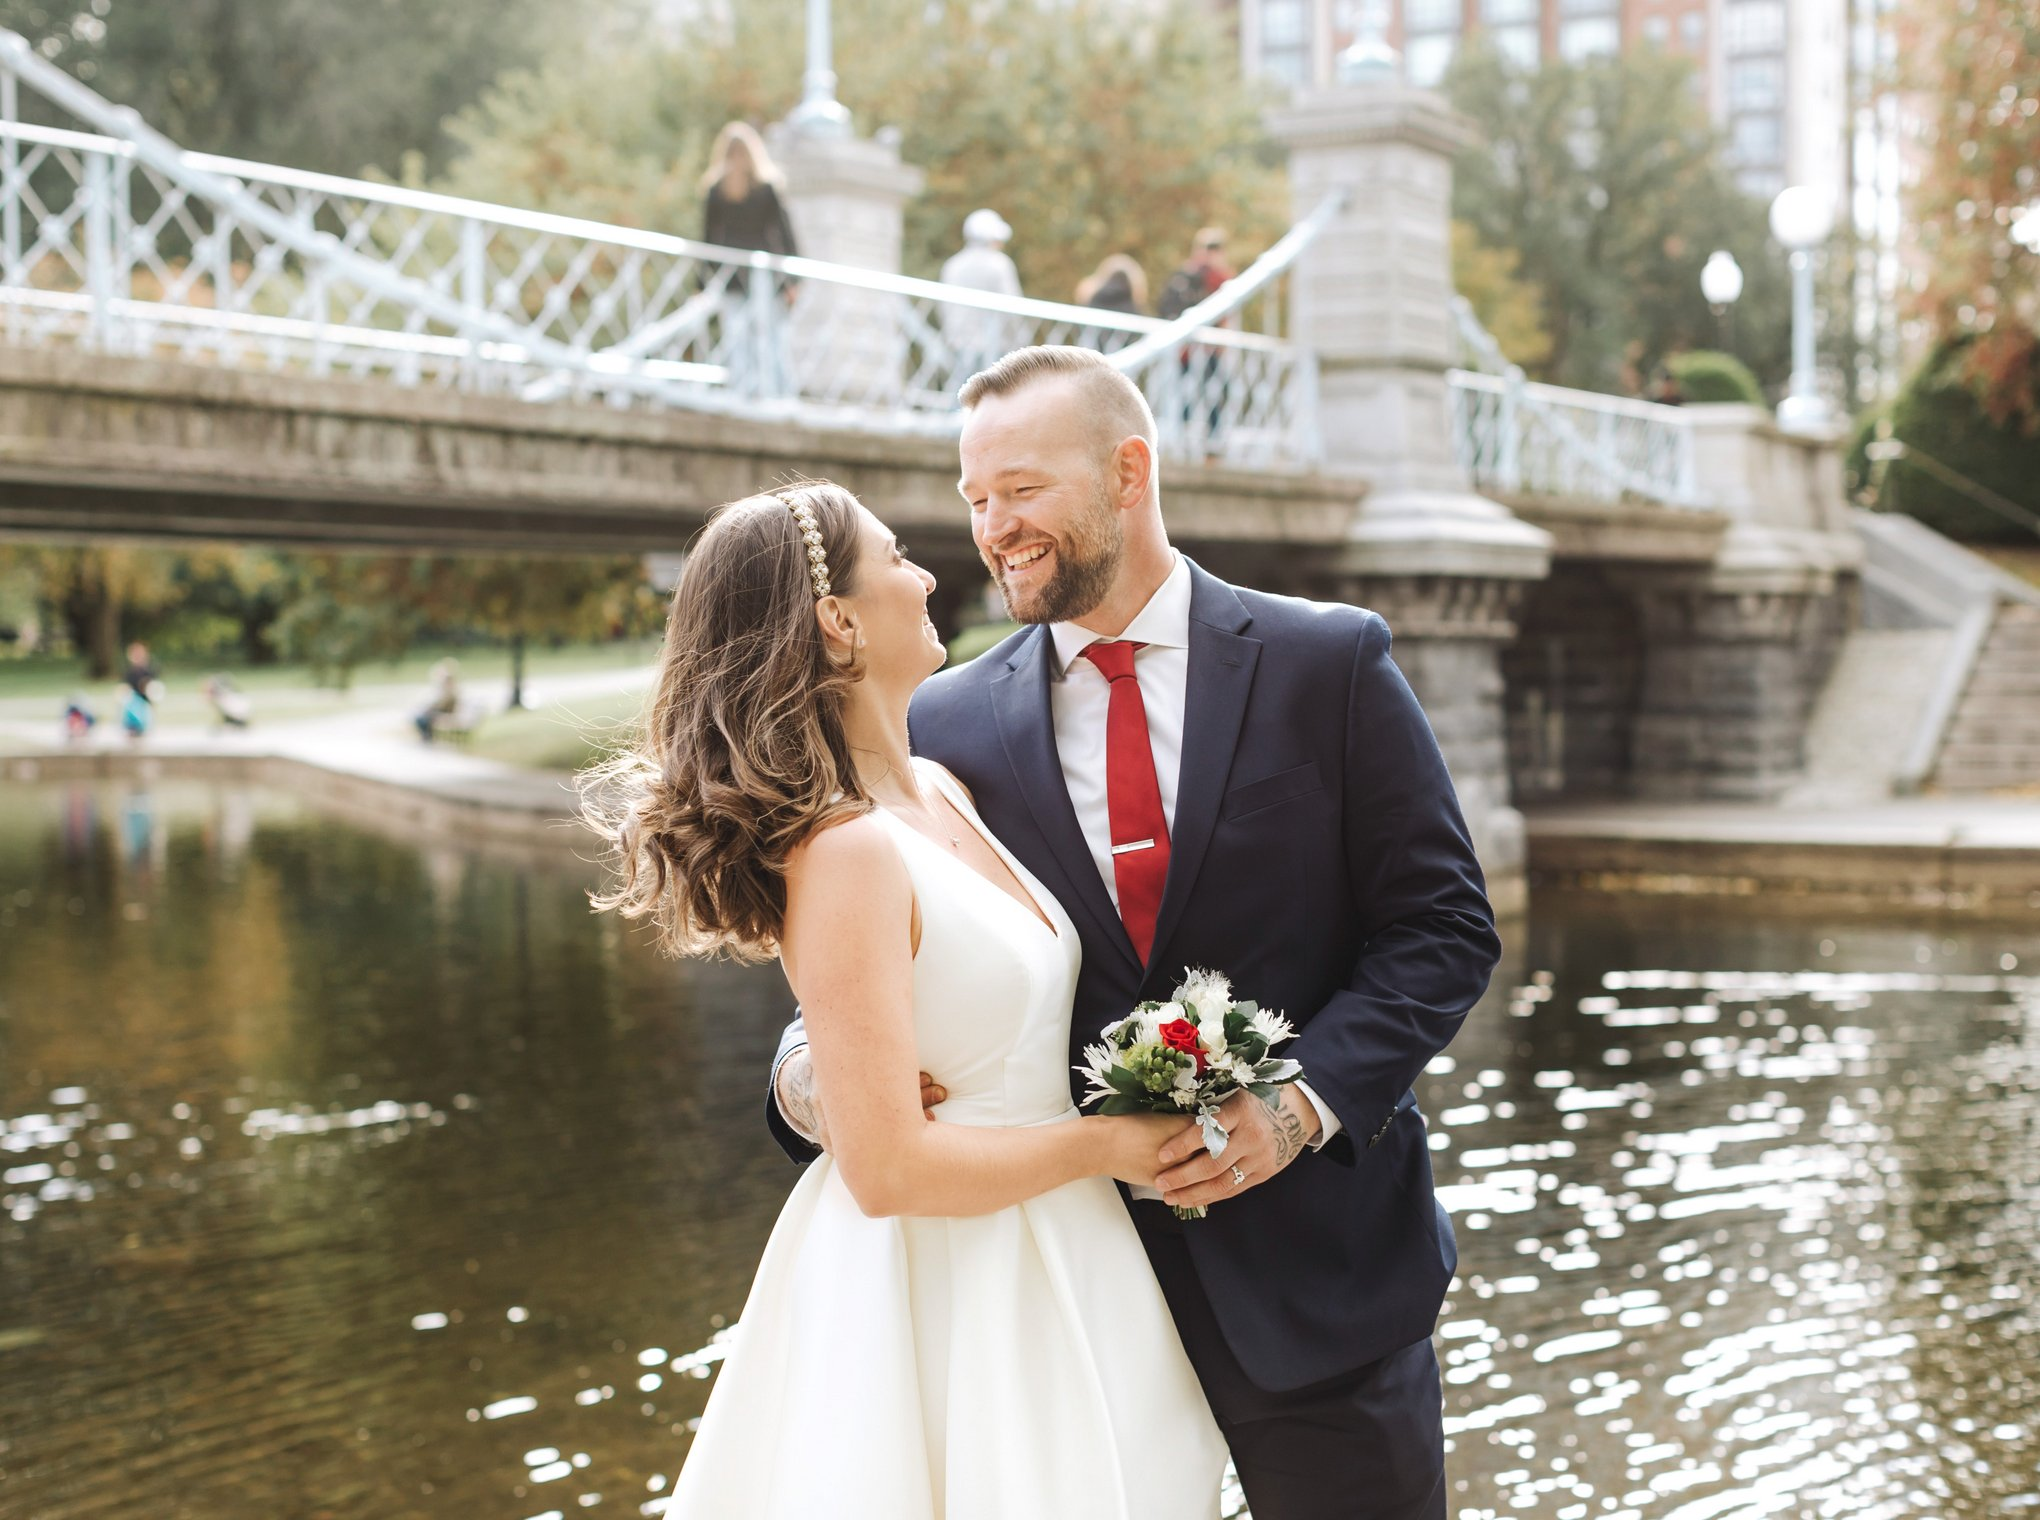 Boston-City-Hall-Wedding-Elopement-Photographer-Lena-Mirisola-16.JPG